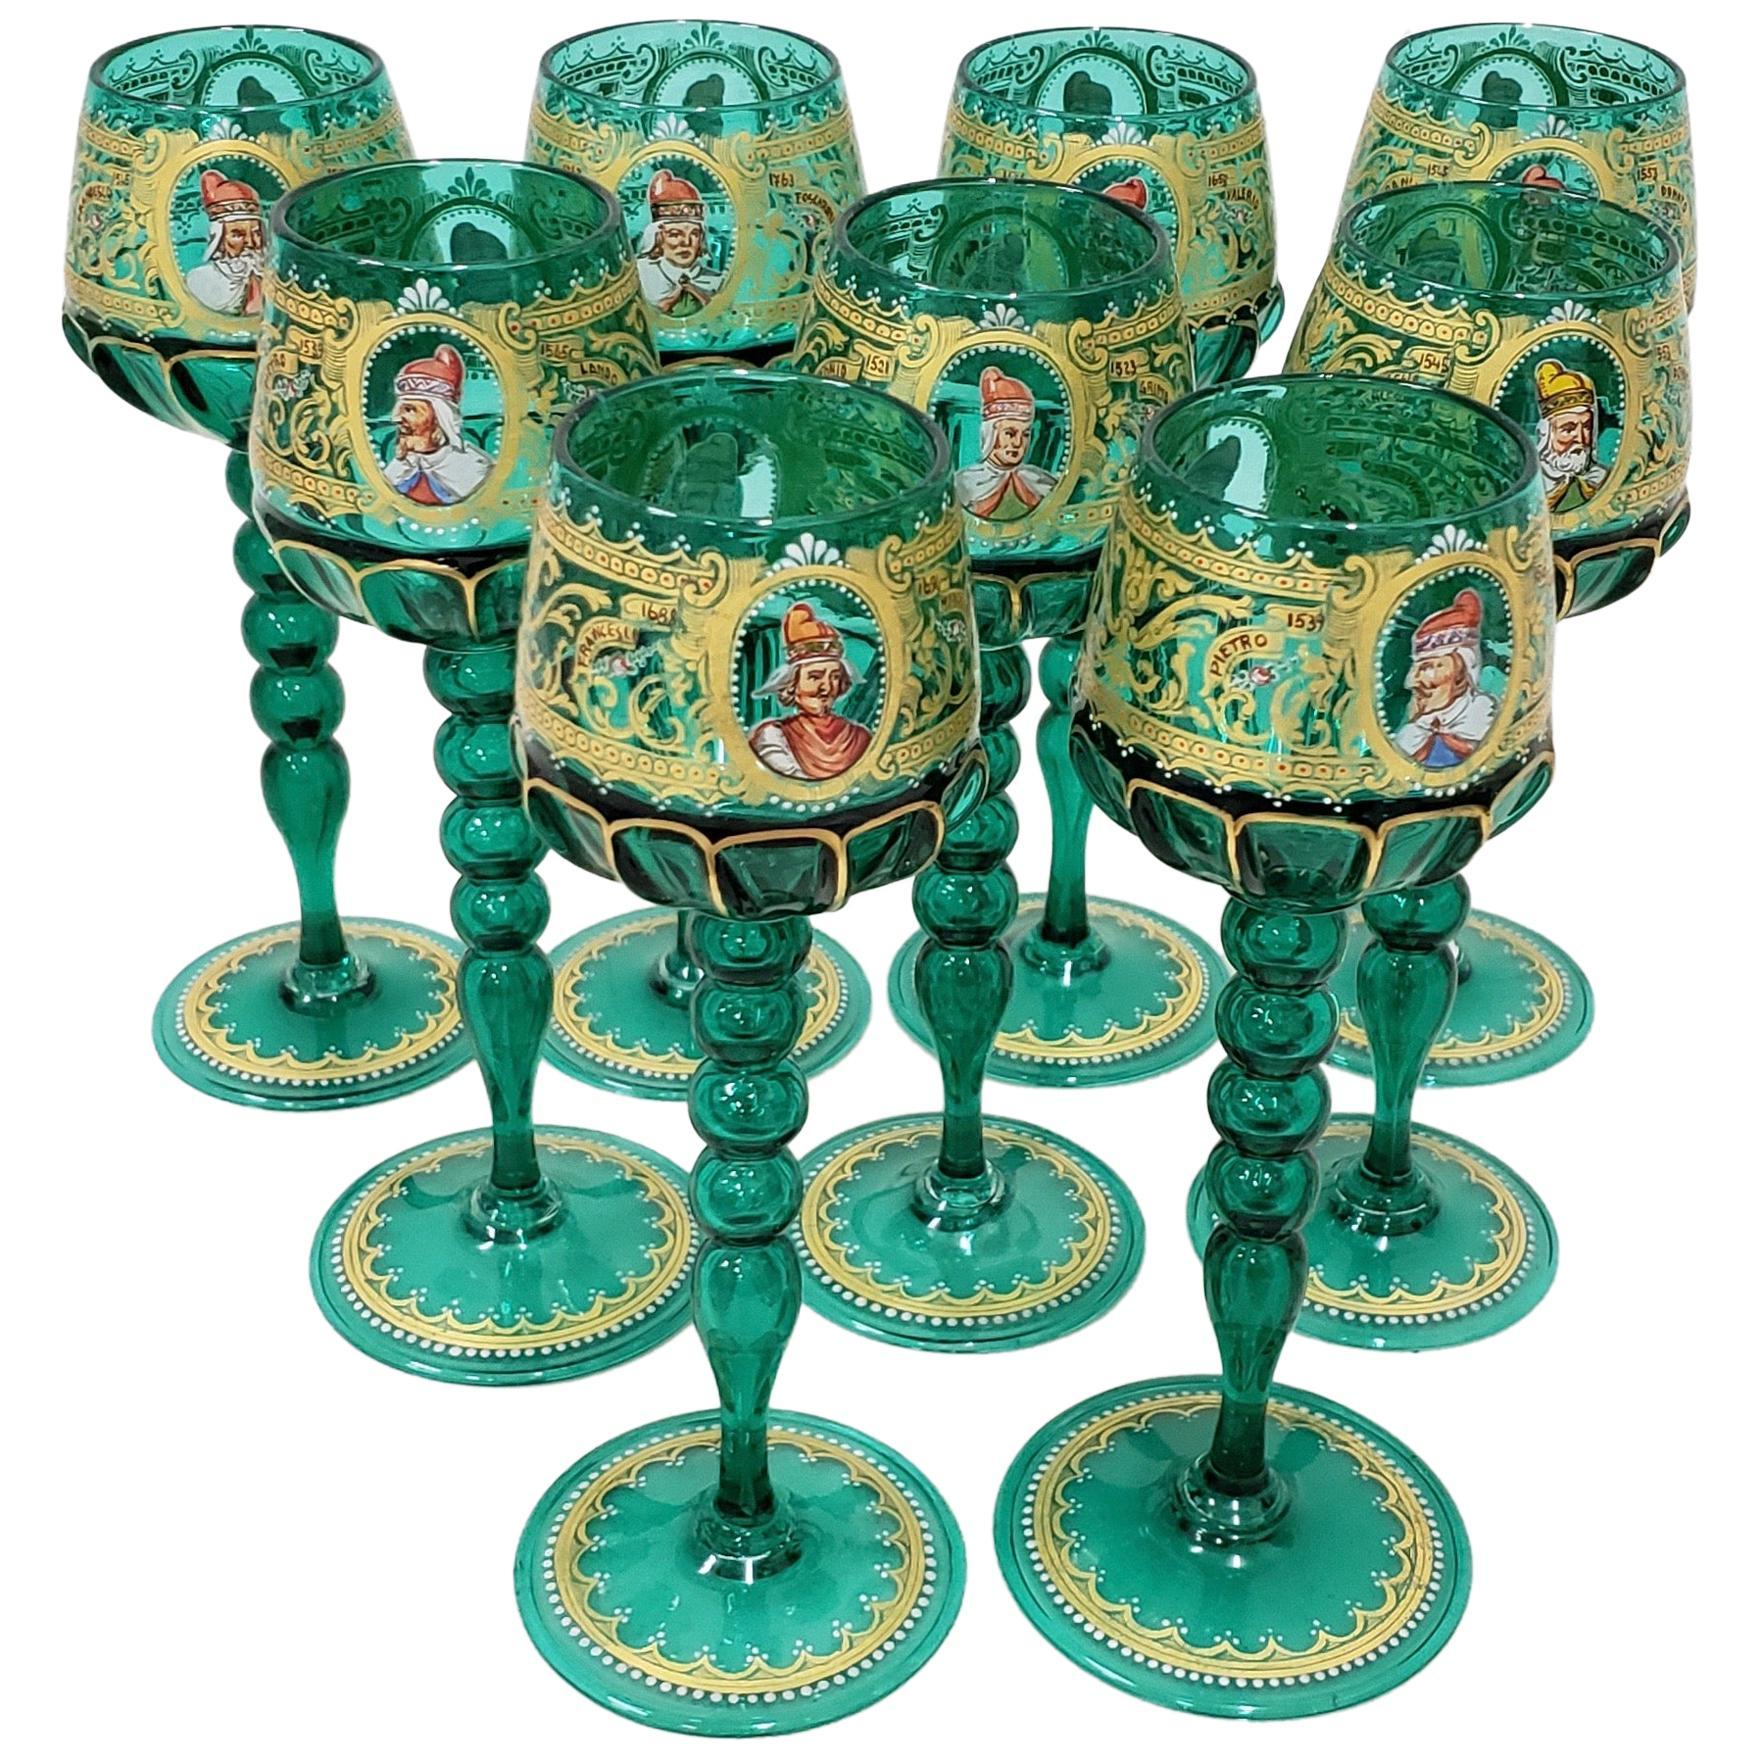 Set of 9 Salviati Murano Wine Glasses Hand Painted with Notable Venetian Figures